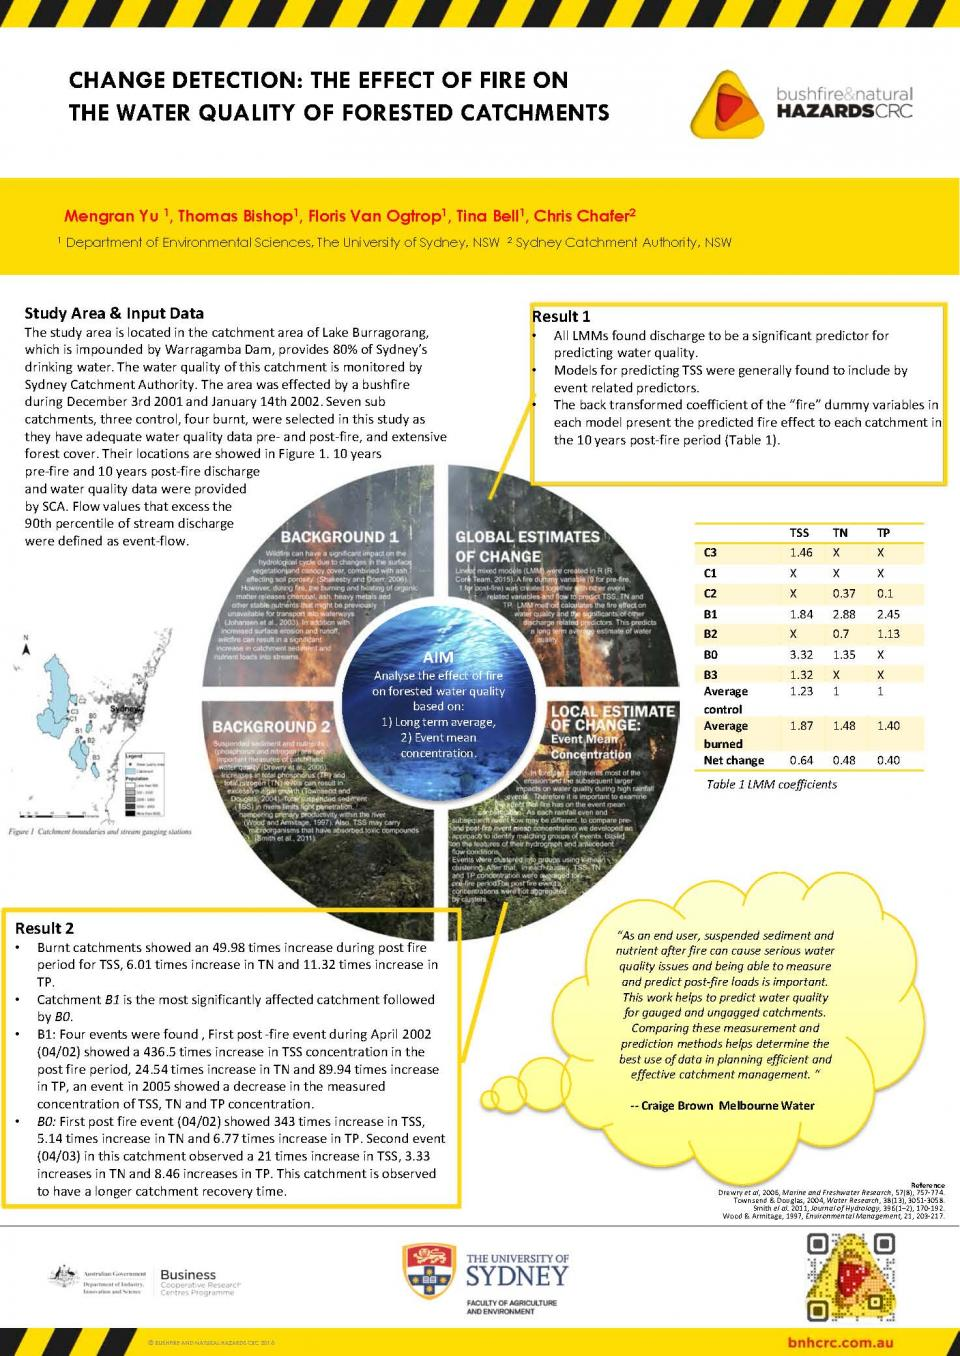 Mengran Yu Conference Poster 2016